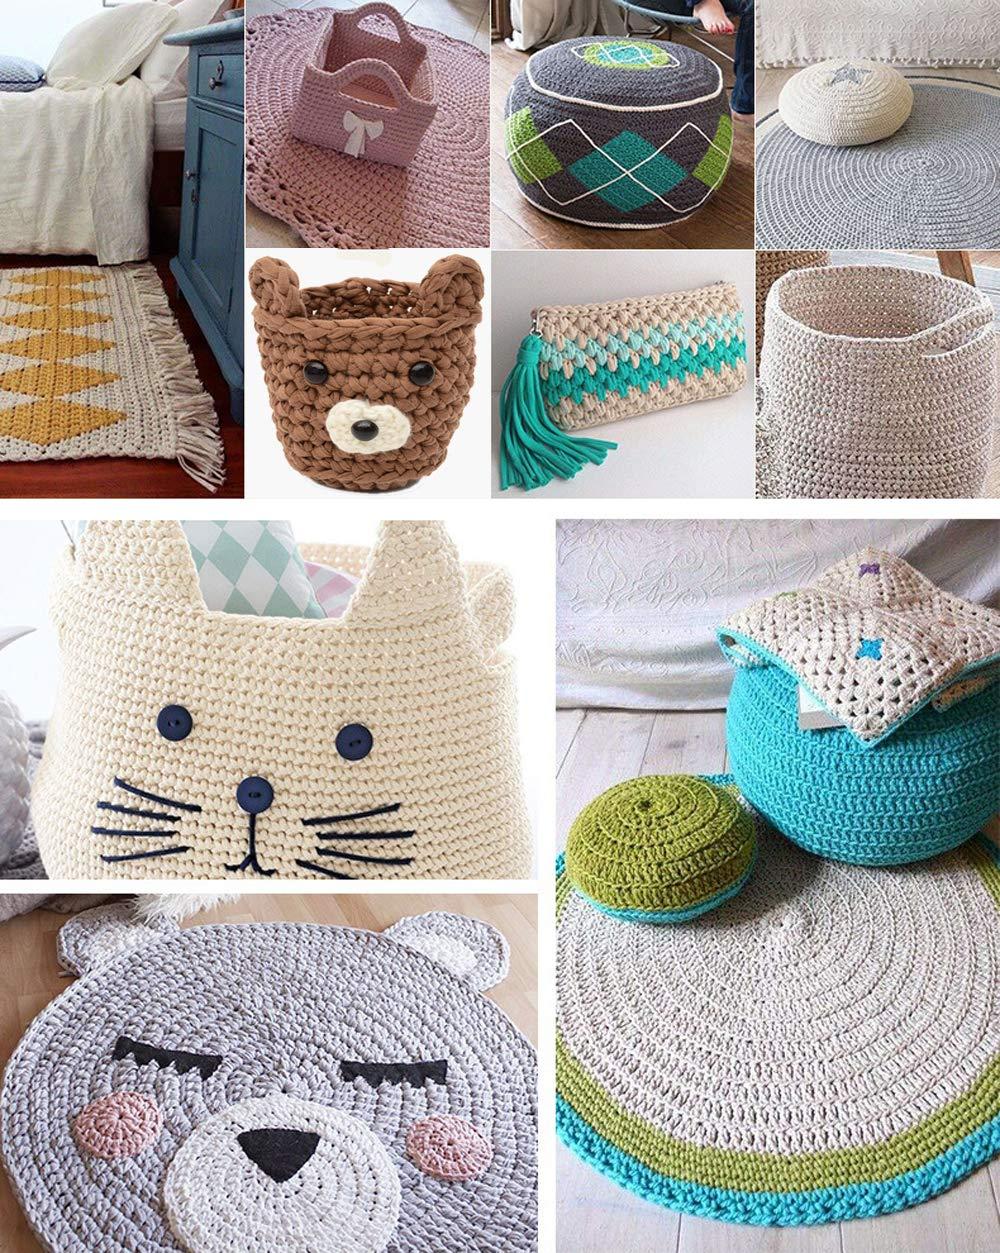 Amazon.com: Hilo de tejer tela de tela para camiseta, lana ...